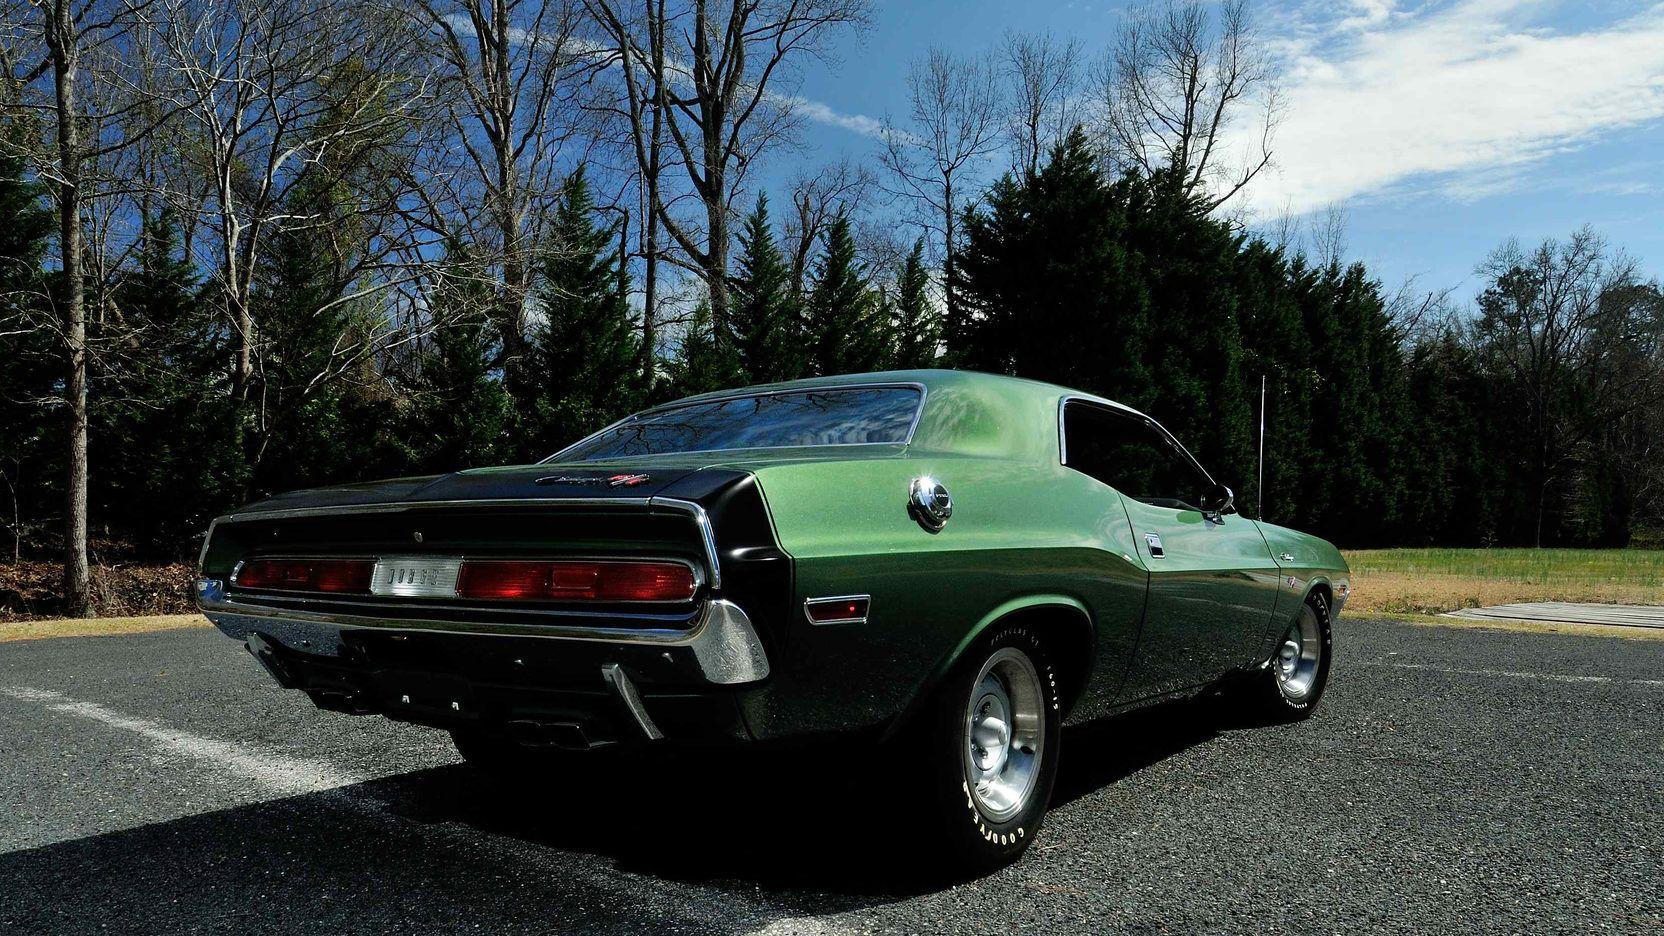 1970 Dodge Hemi Challenger Rt Shaker Car F8 Dark Green Metallic